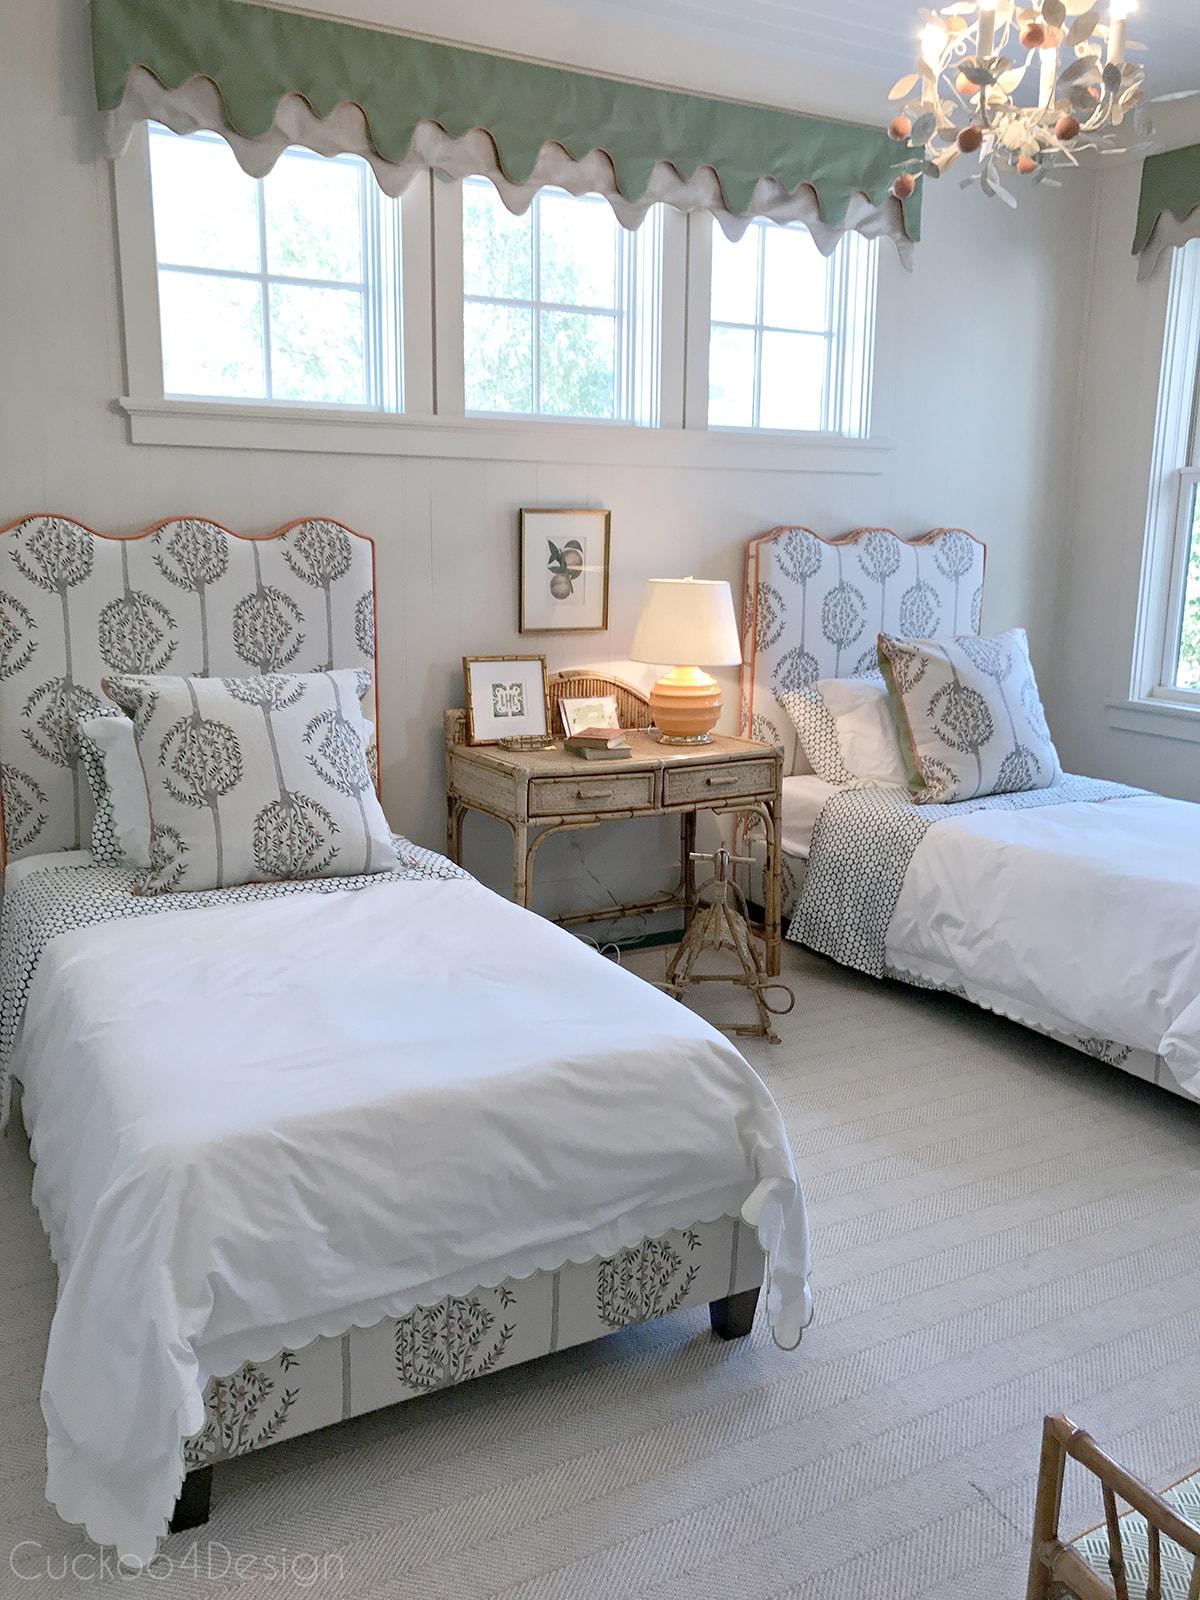 kids bedroom with upholstered headboard, orange trim and vintage wicker furniture